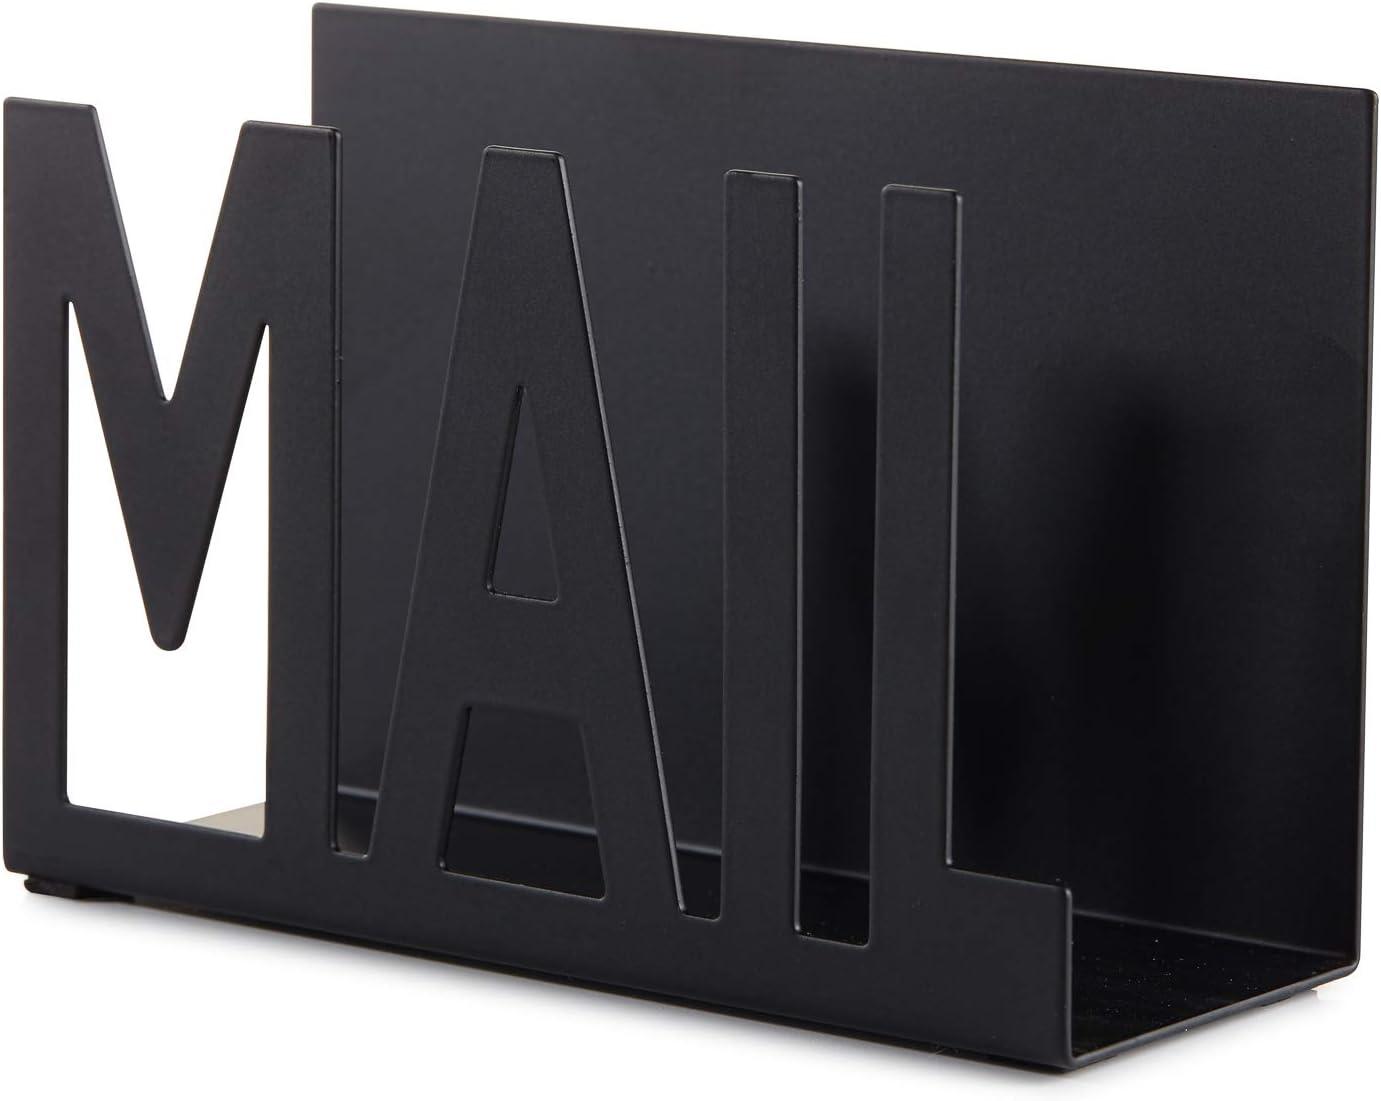 Interoceanic 2pcs Mail Sorter Organizer Desktop Metal Letter Holder Bill Filing Paper Document Keep Neat for Farmhouse Rustic Home School Black